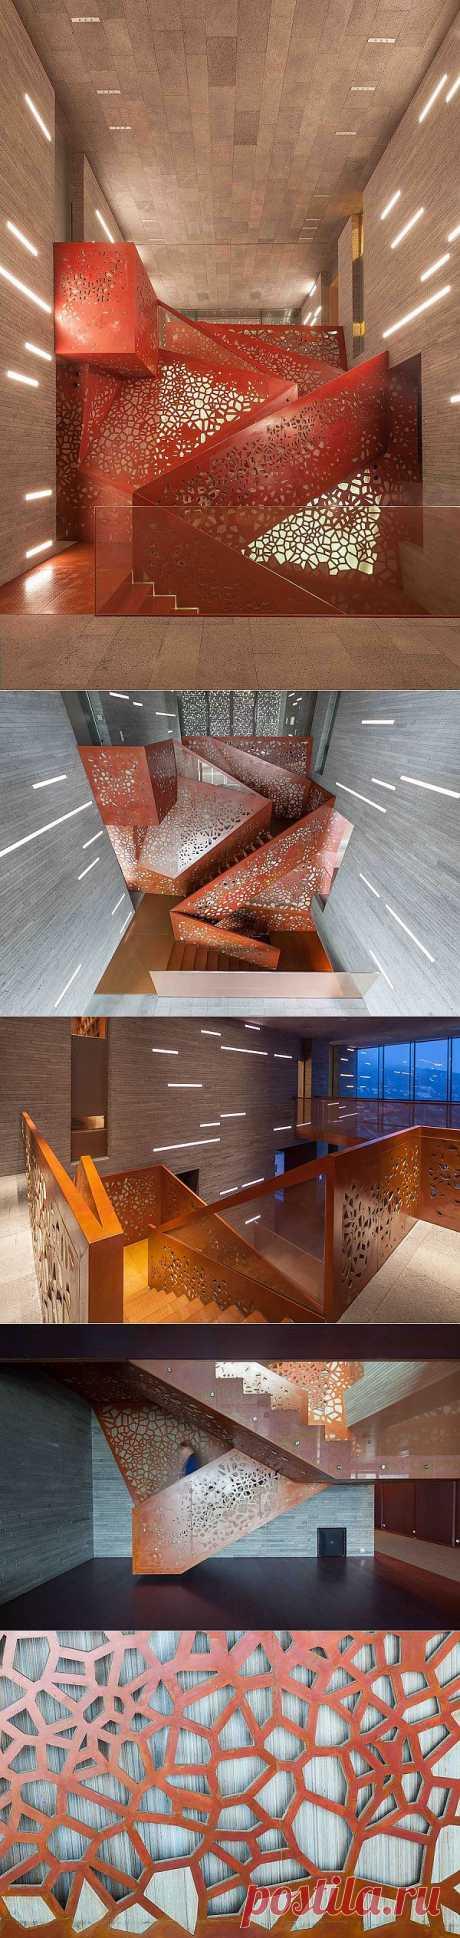 Необычная лестница от ARUP - Мир отделки и ремонта